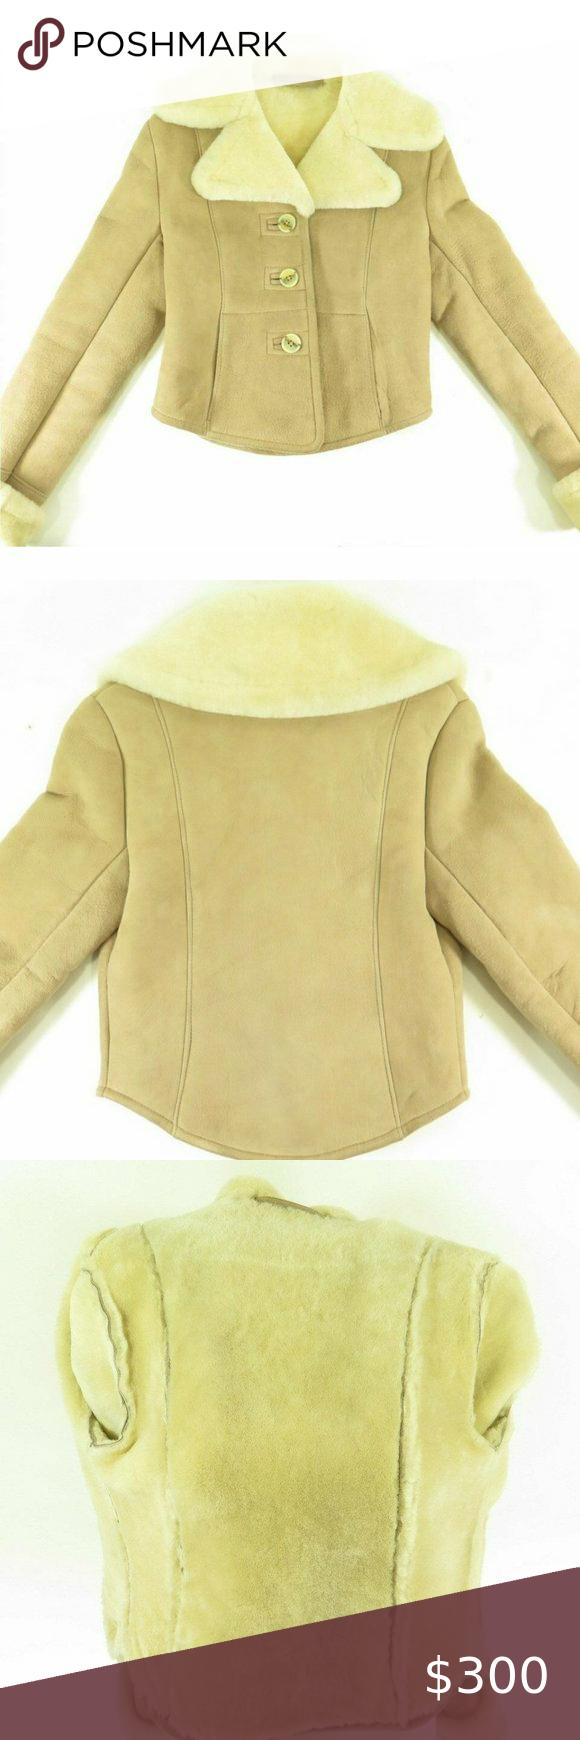 Vintage Matterhorn Sheepskin Shearling Jacket S Shearling Jacket Beige Leather Jacket Vintage Leather Jacket [ 1740 x 580 Pixel ]